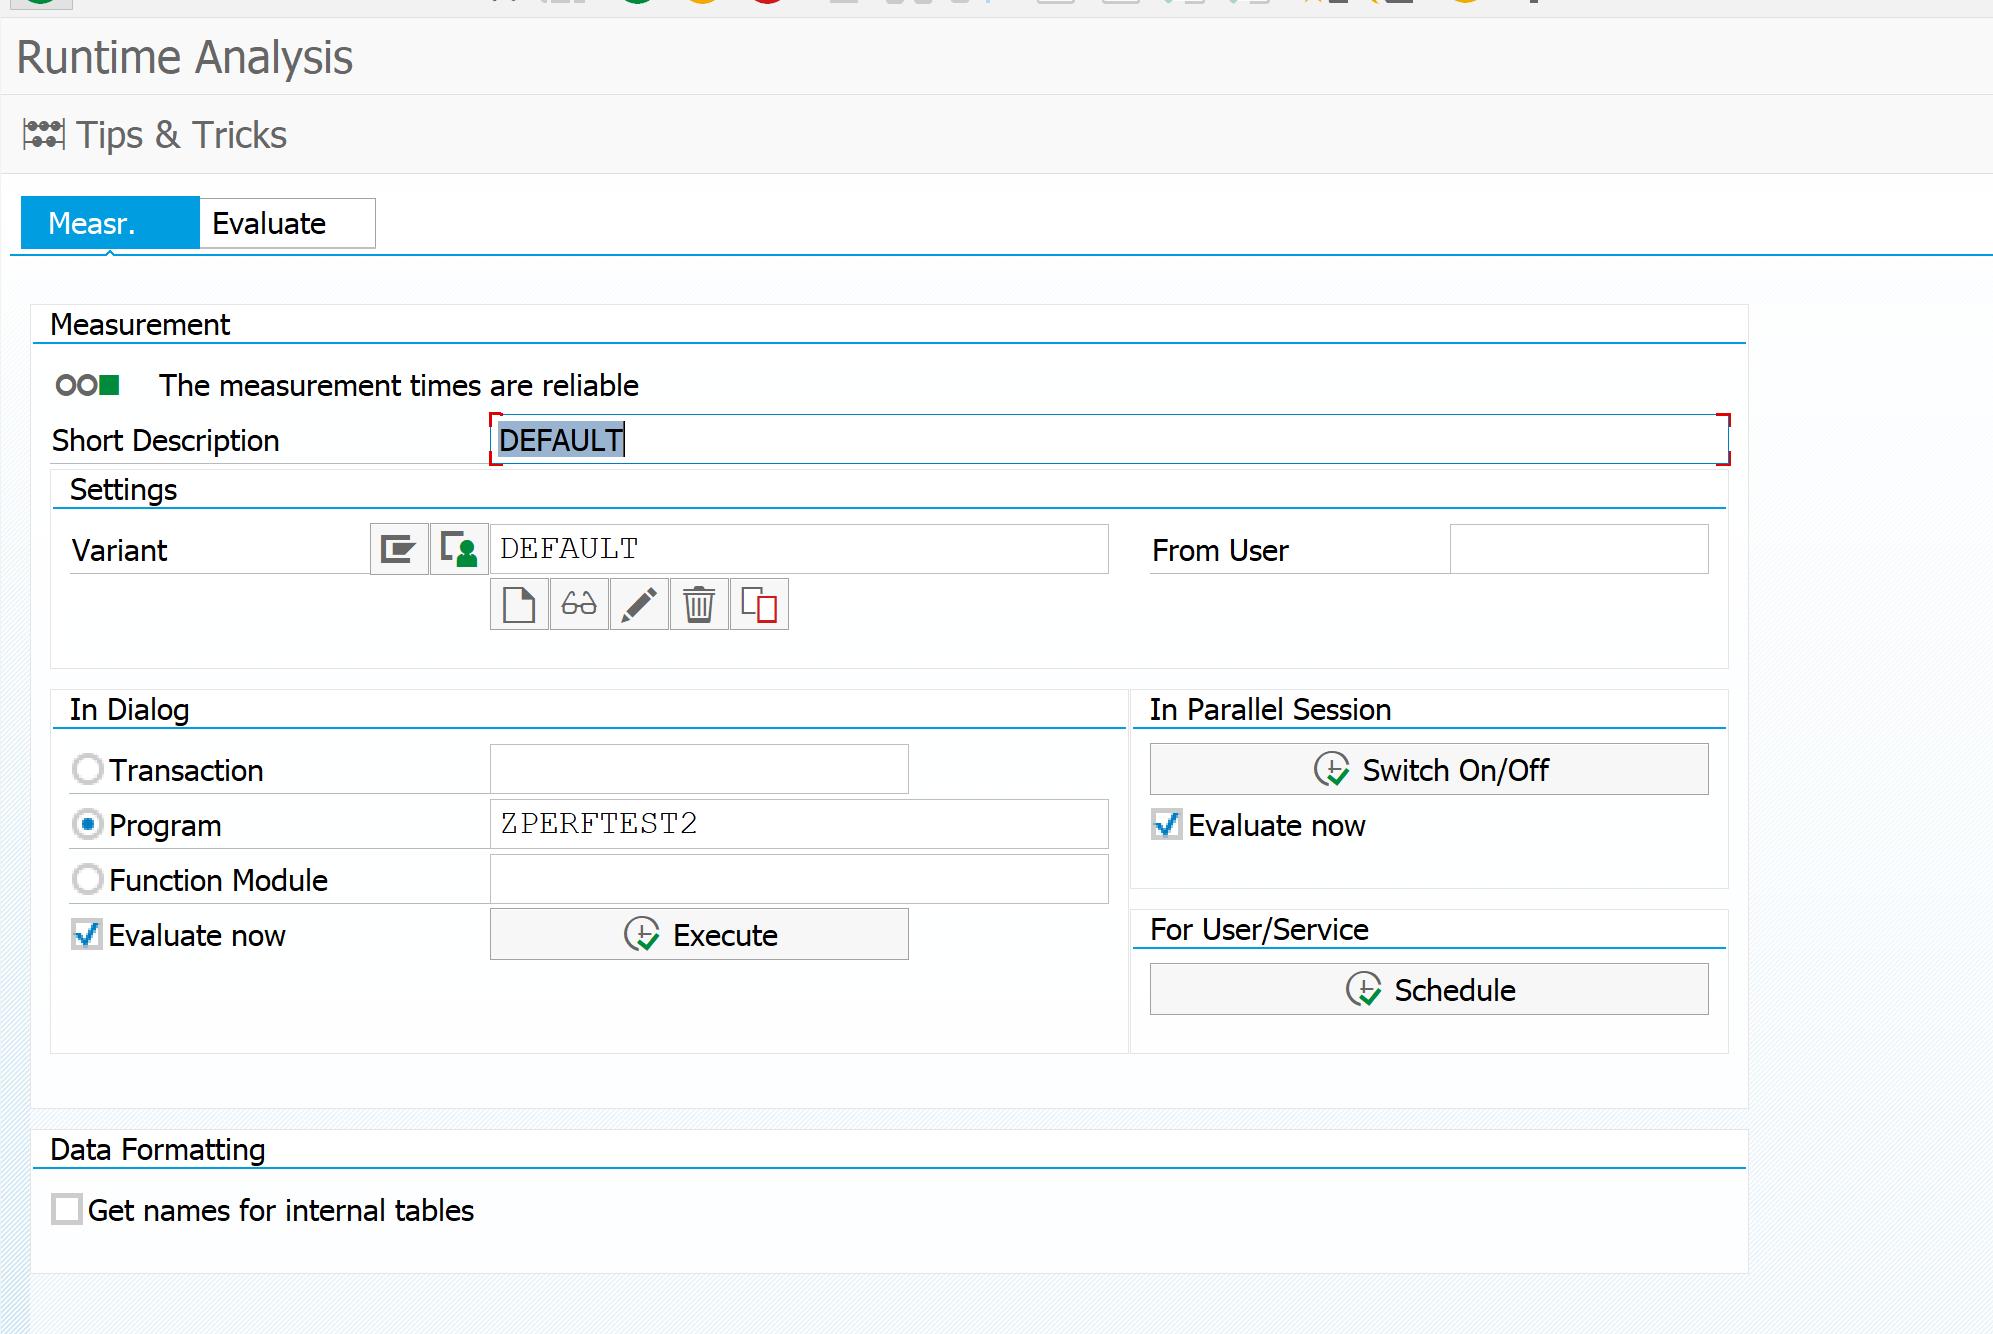 SAT ABAP runtime analysis - Saptechnicalguru com